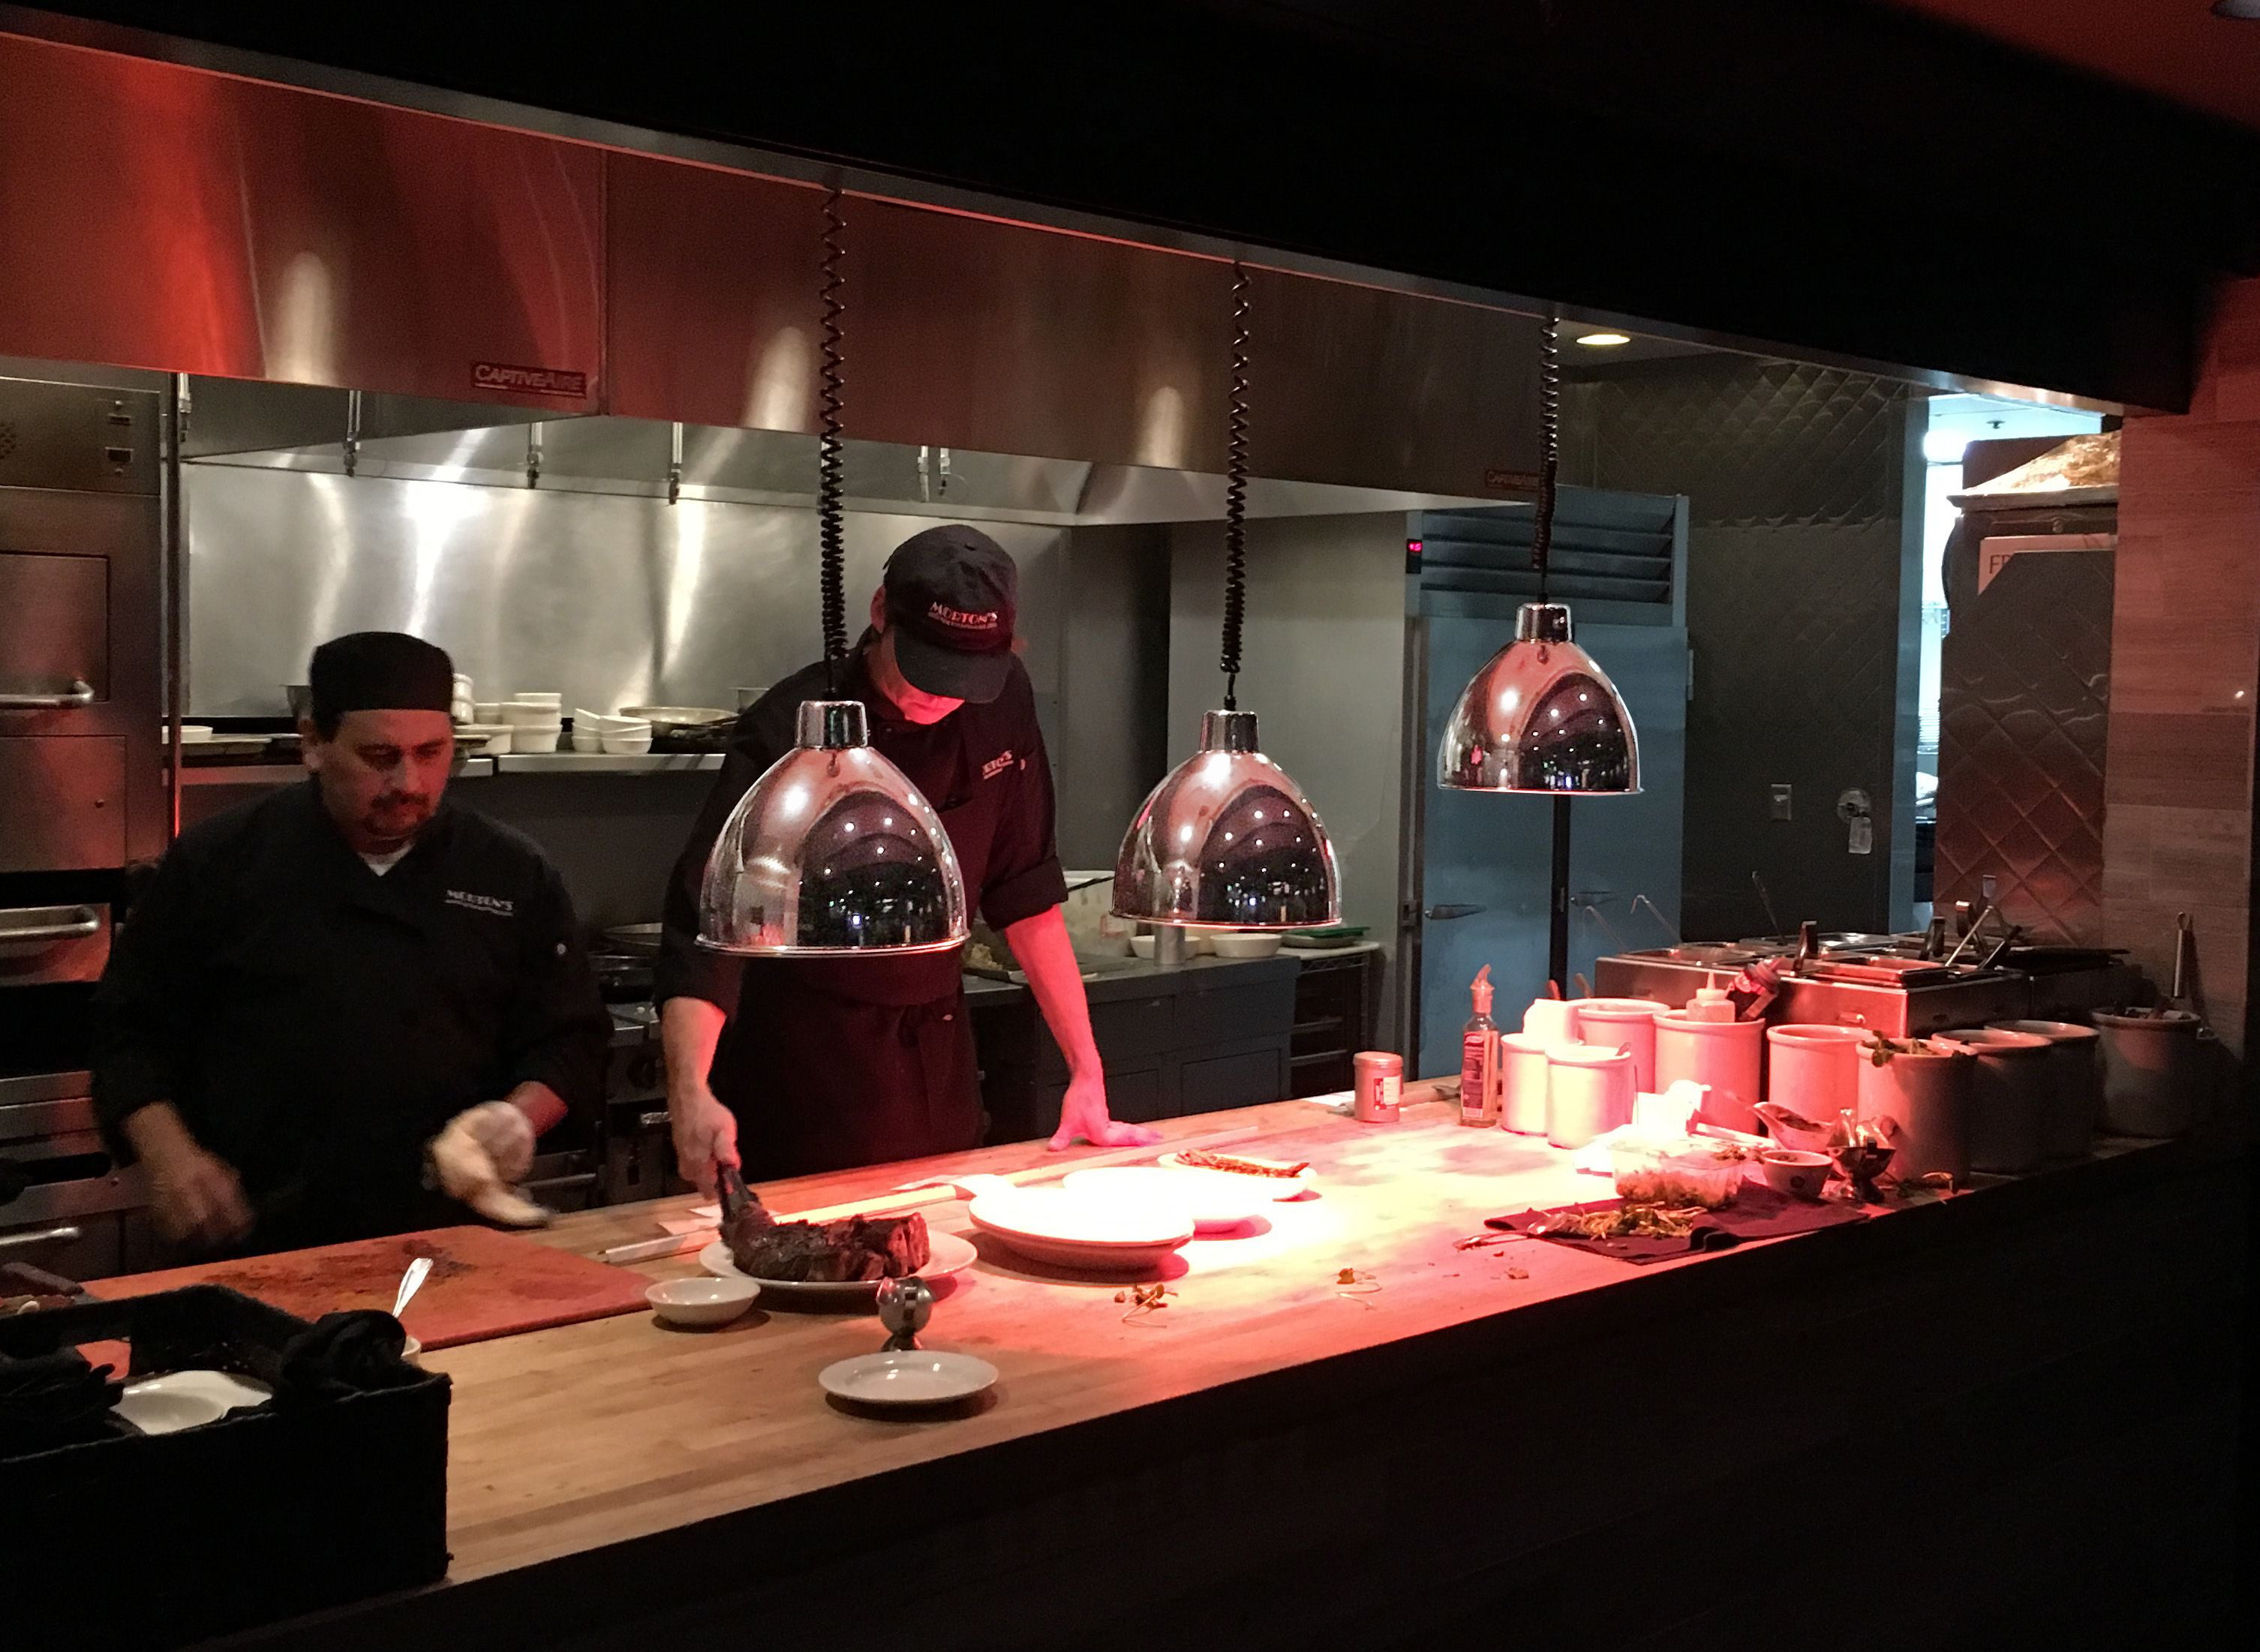 Morton S Steakhouse Los Angeles With Hanson Retractable Heat Lamps